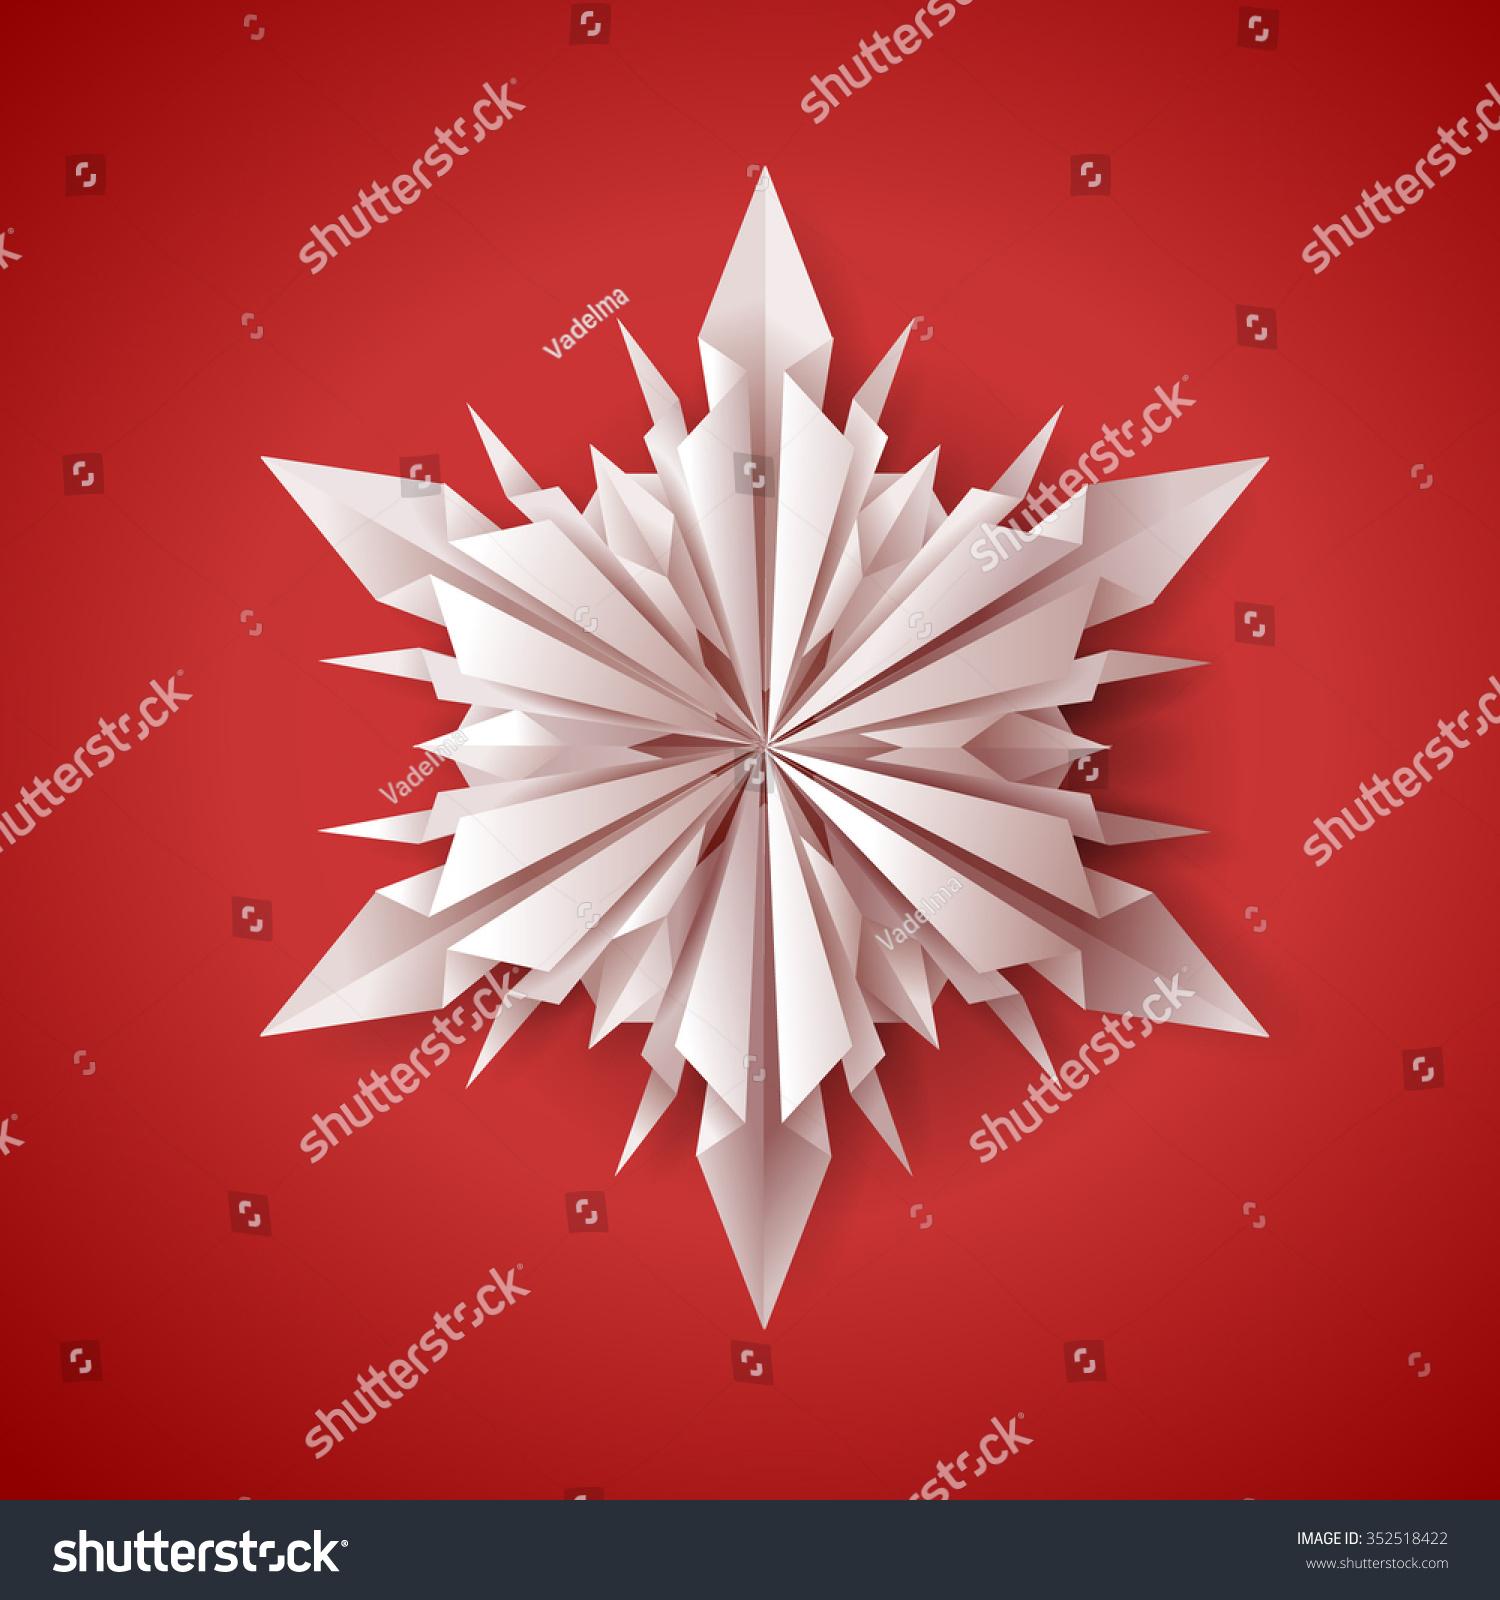 Unique 3d Origamipaper Folded Snowflake Card Stock Vector